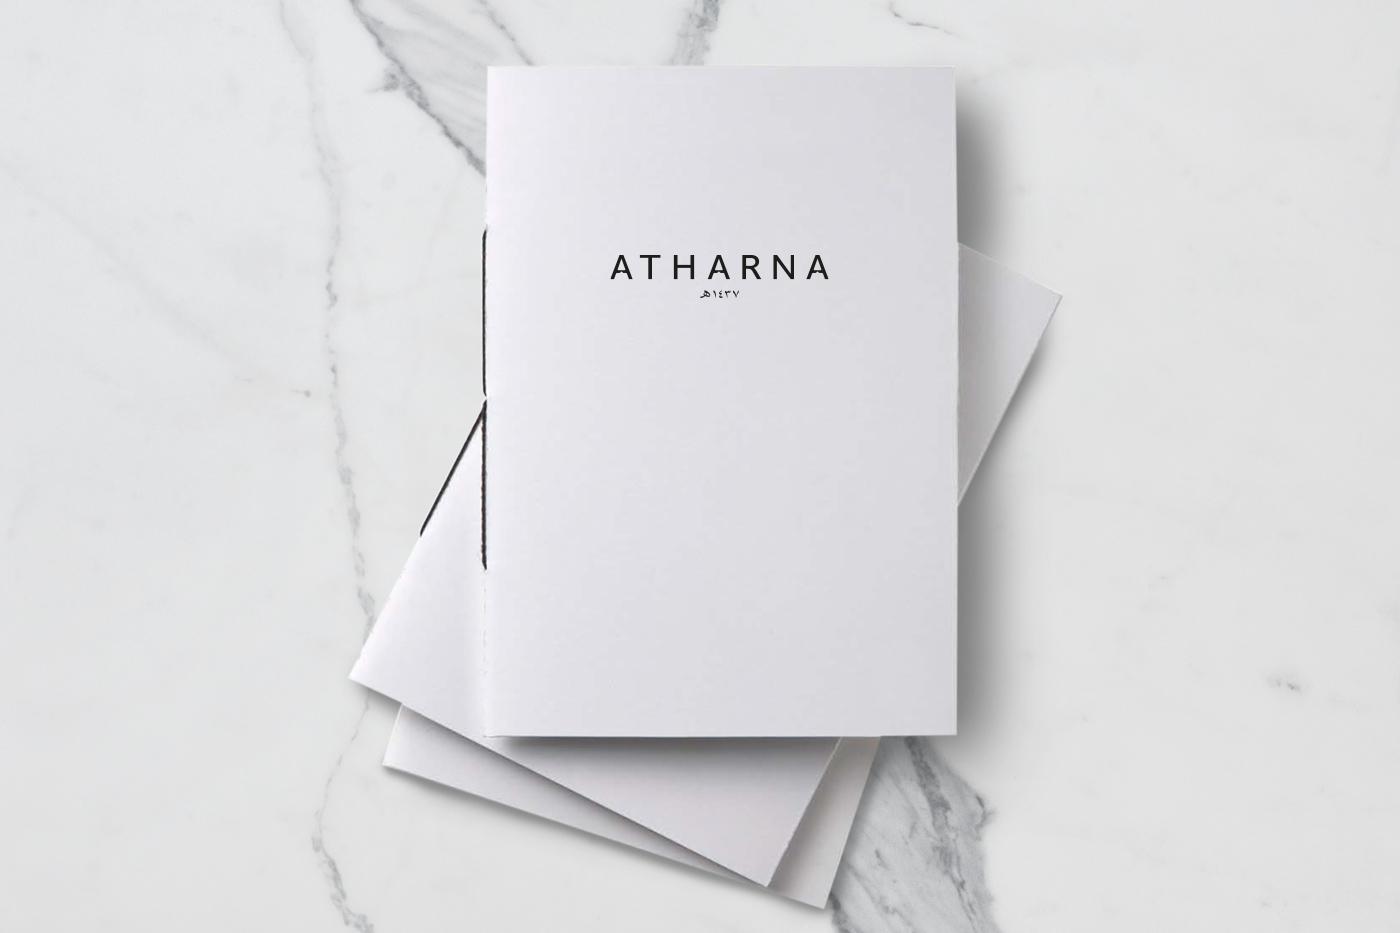 Atharna lookbook homepage image